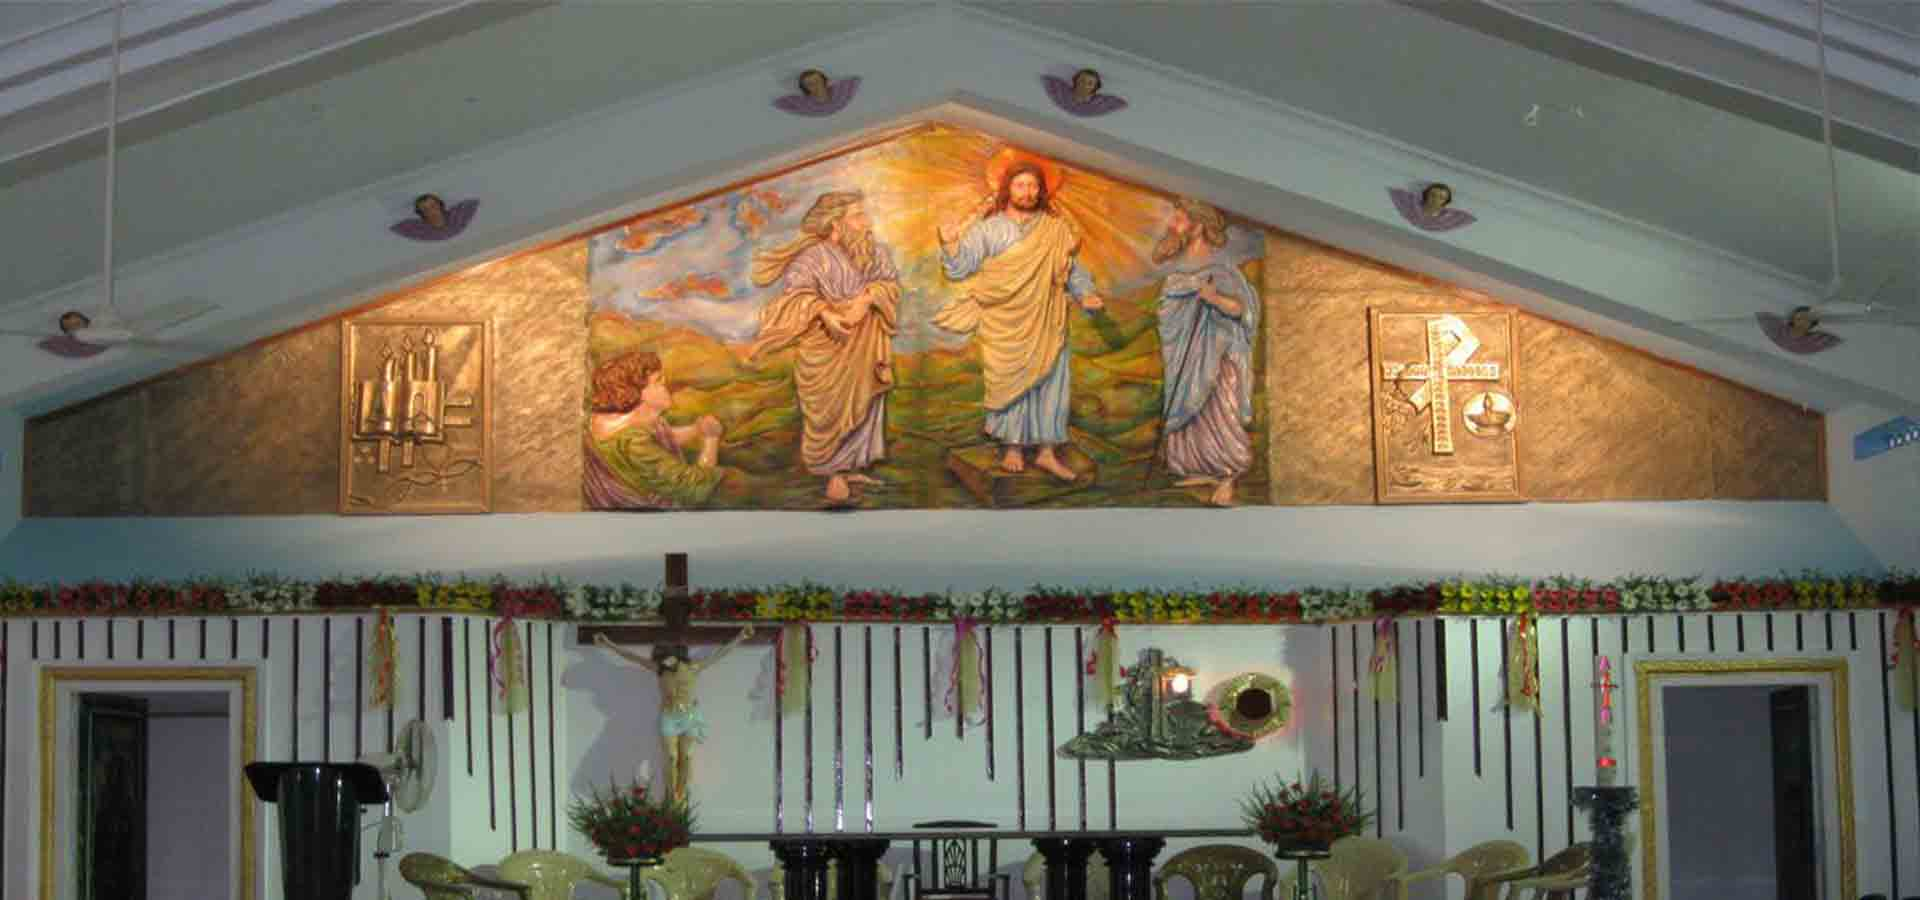 Church Art Project 3